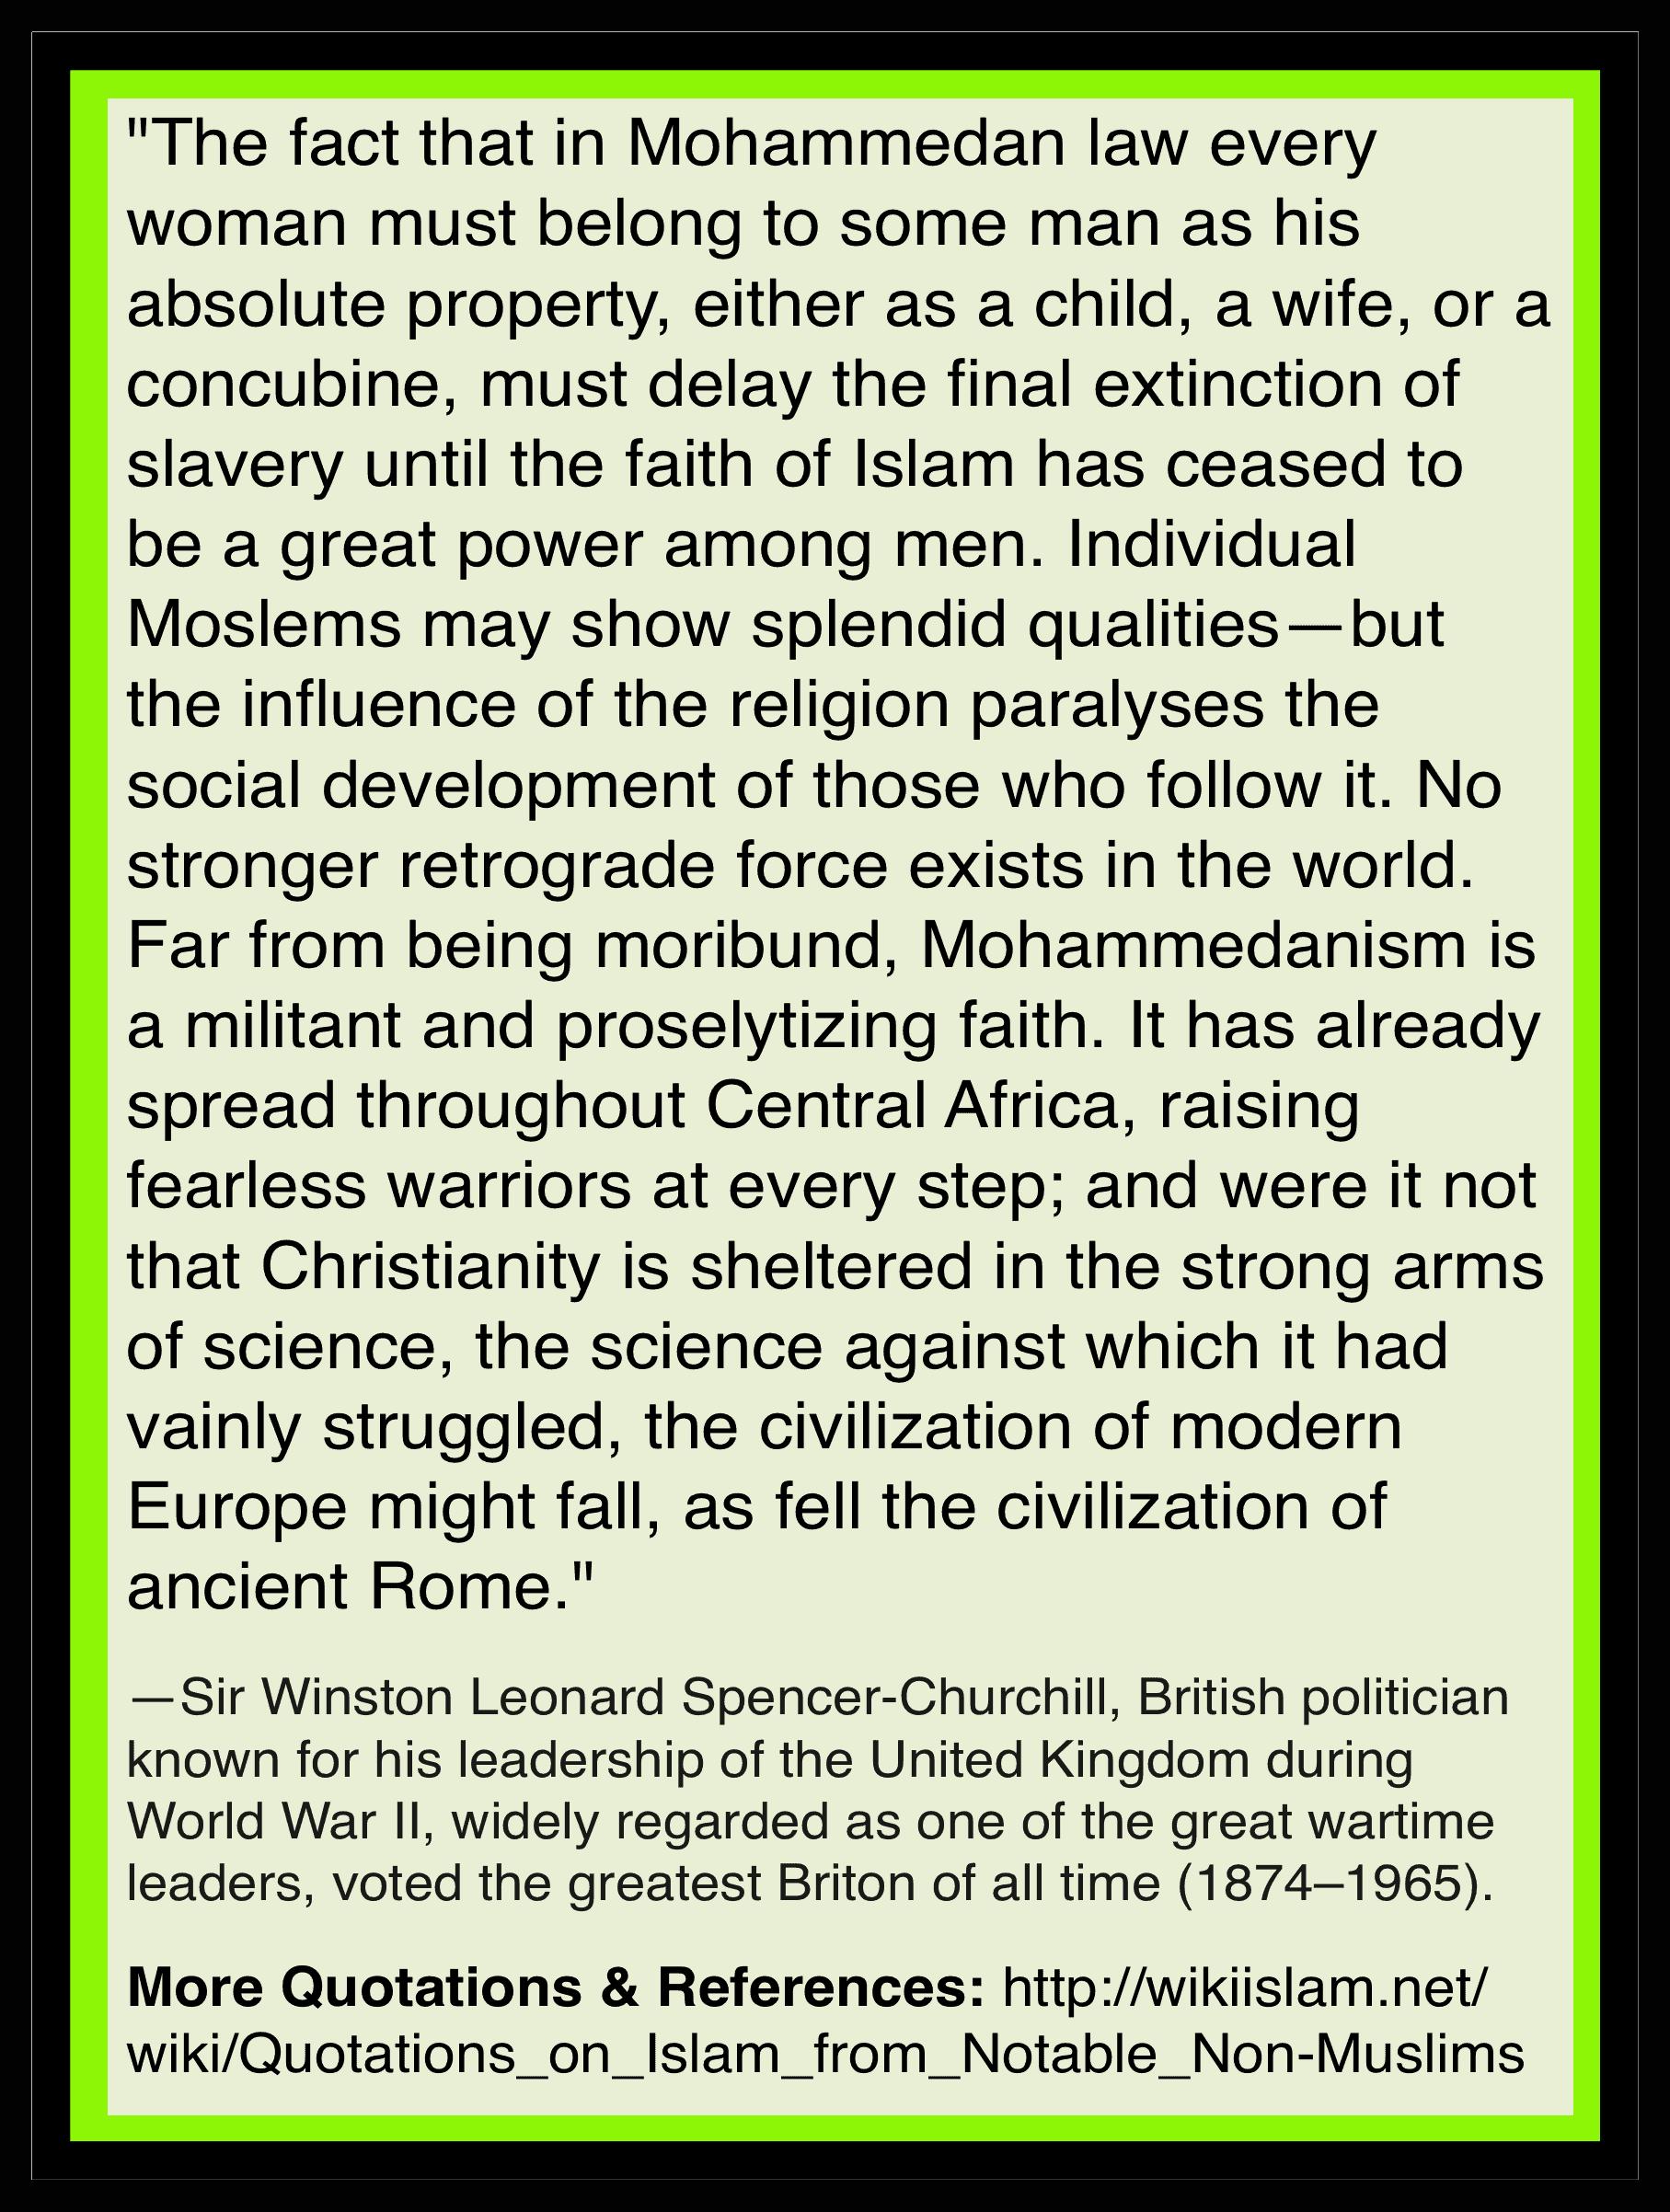 Islam stops social development